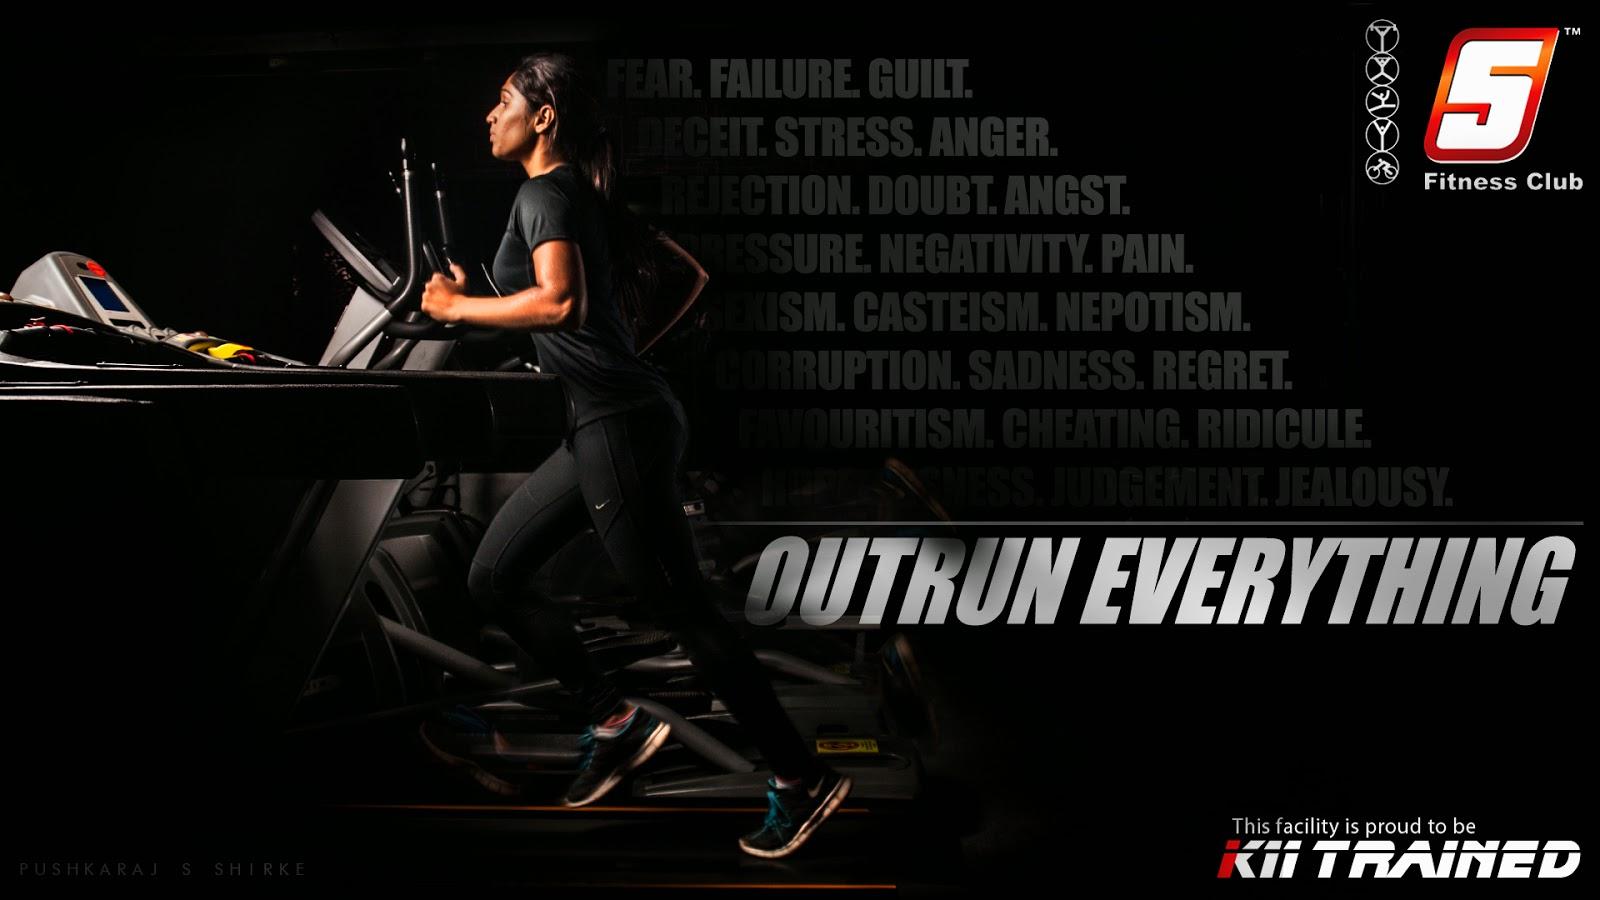 Pushkaraj S Shirke 5 Fitness Club Poster Campaign